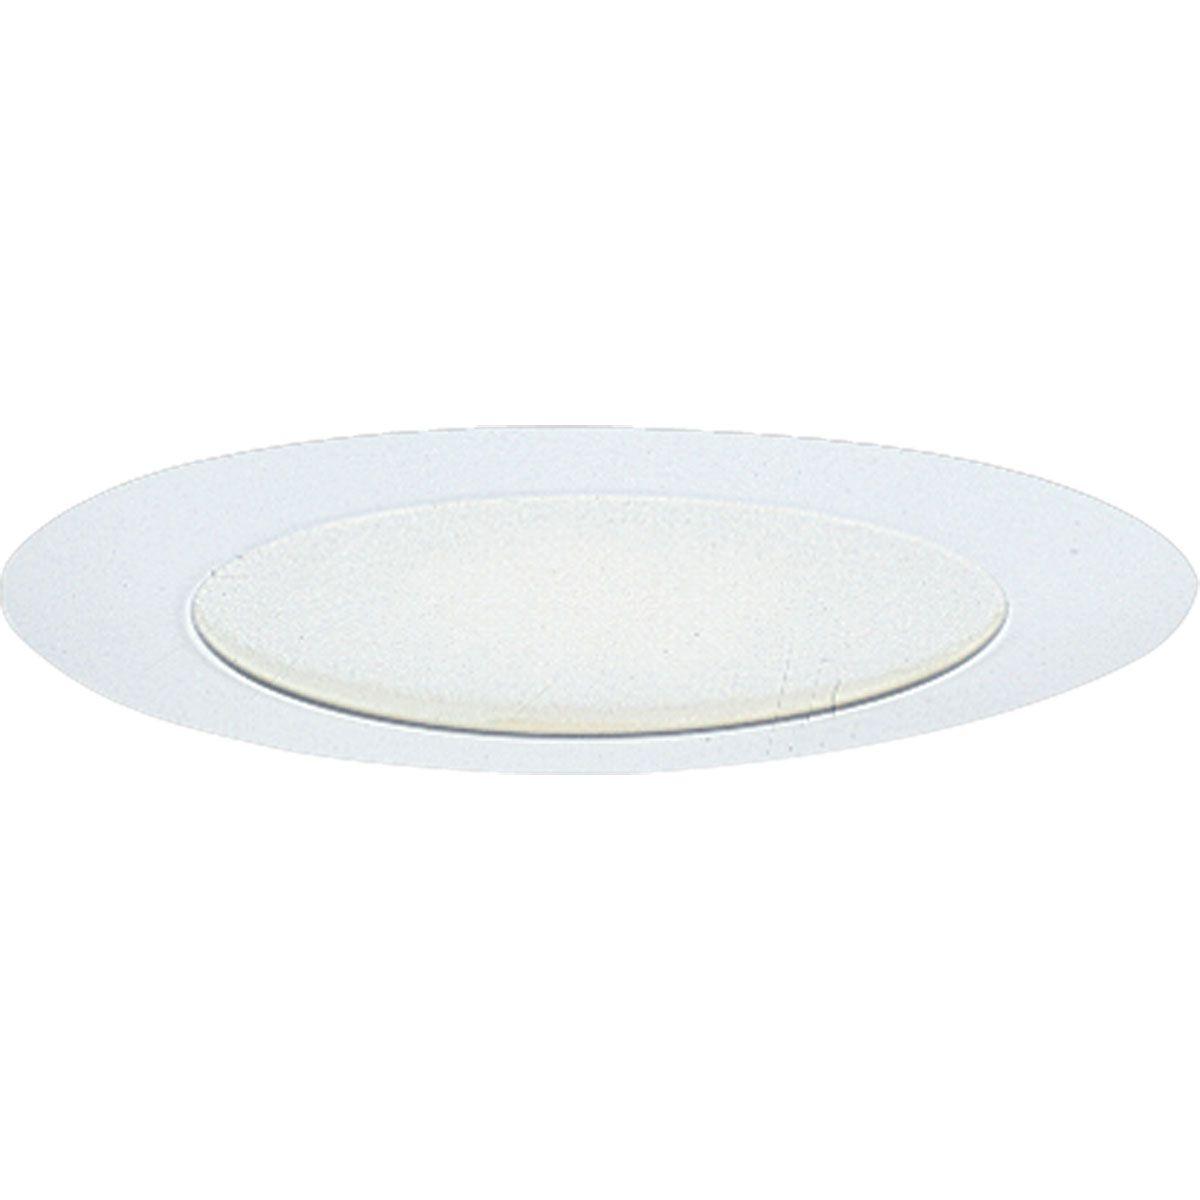 PROP8060-28 METAL FLANGE, ALBALITE GLASS; ALBALITE BRIGHT WHITE; 6 INCH NOMINAL APERTURE SIZE; ROUND APERTURE SHAPE; A19 60 W, PAR30SN 75 W INCANDESCENT LAMP; A19 40 W FLUORESCENT LAMP; INSULATED/NON INSULATED CEILING; SIZE 7 3/4 INCH DIA; PROGRESS LIGHTING[R] BRAND, PROGRESS